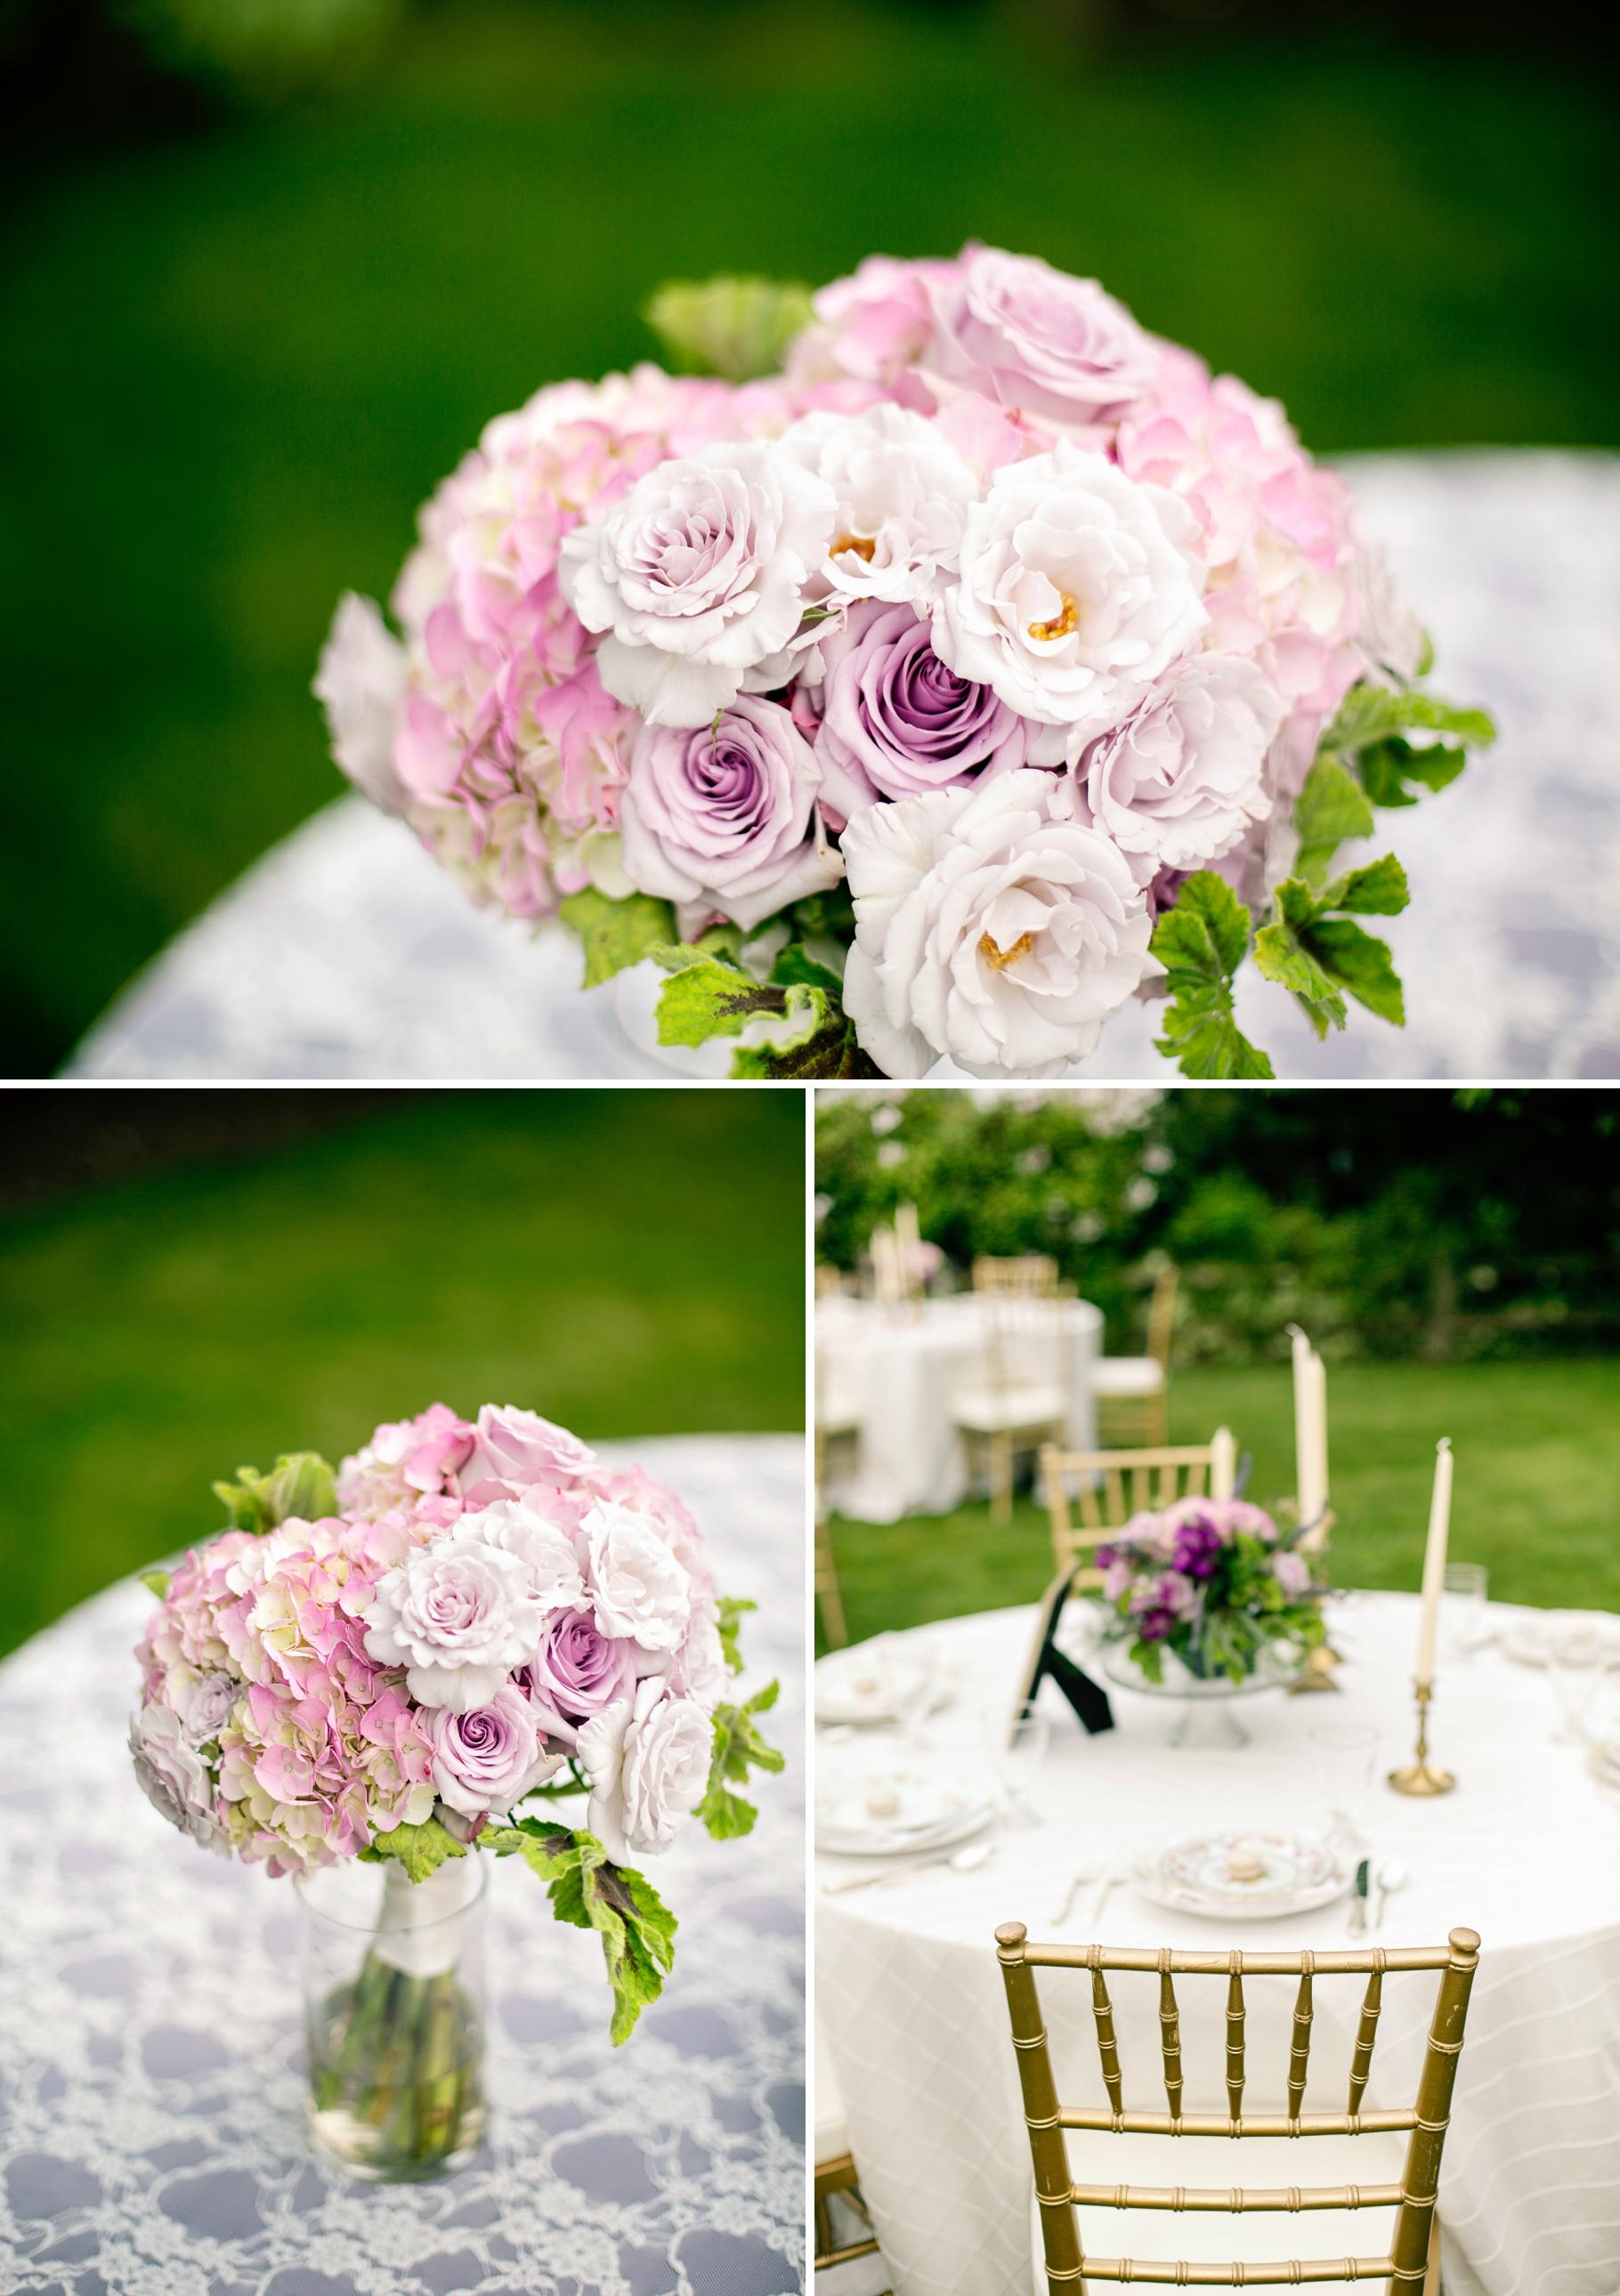 5-Craven-Farm-French-Countryside-Lavendar-Florals-Garden-Reception-Snohomish-Wedding-Tour-Seattle-Photographer-Photography-by-Betty-Elaine